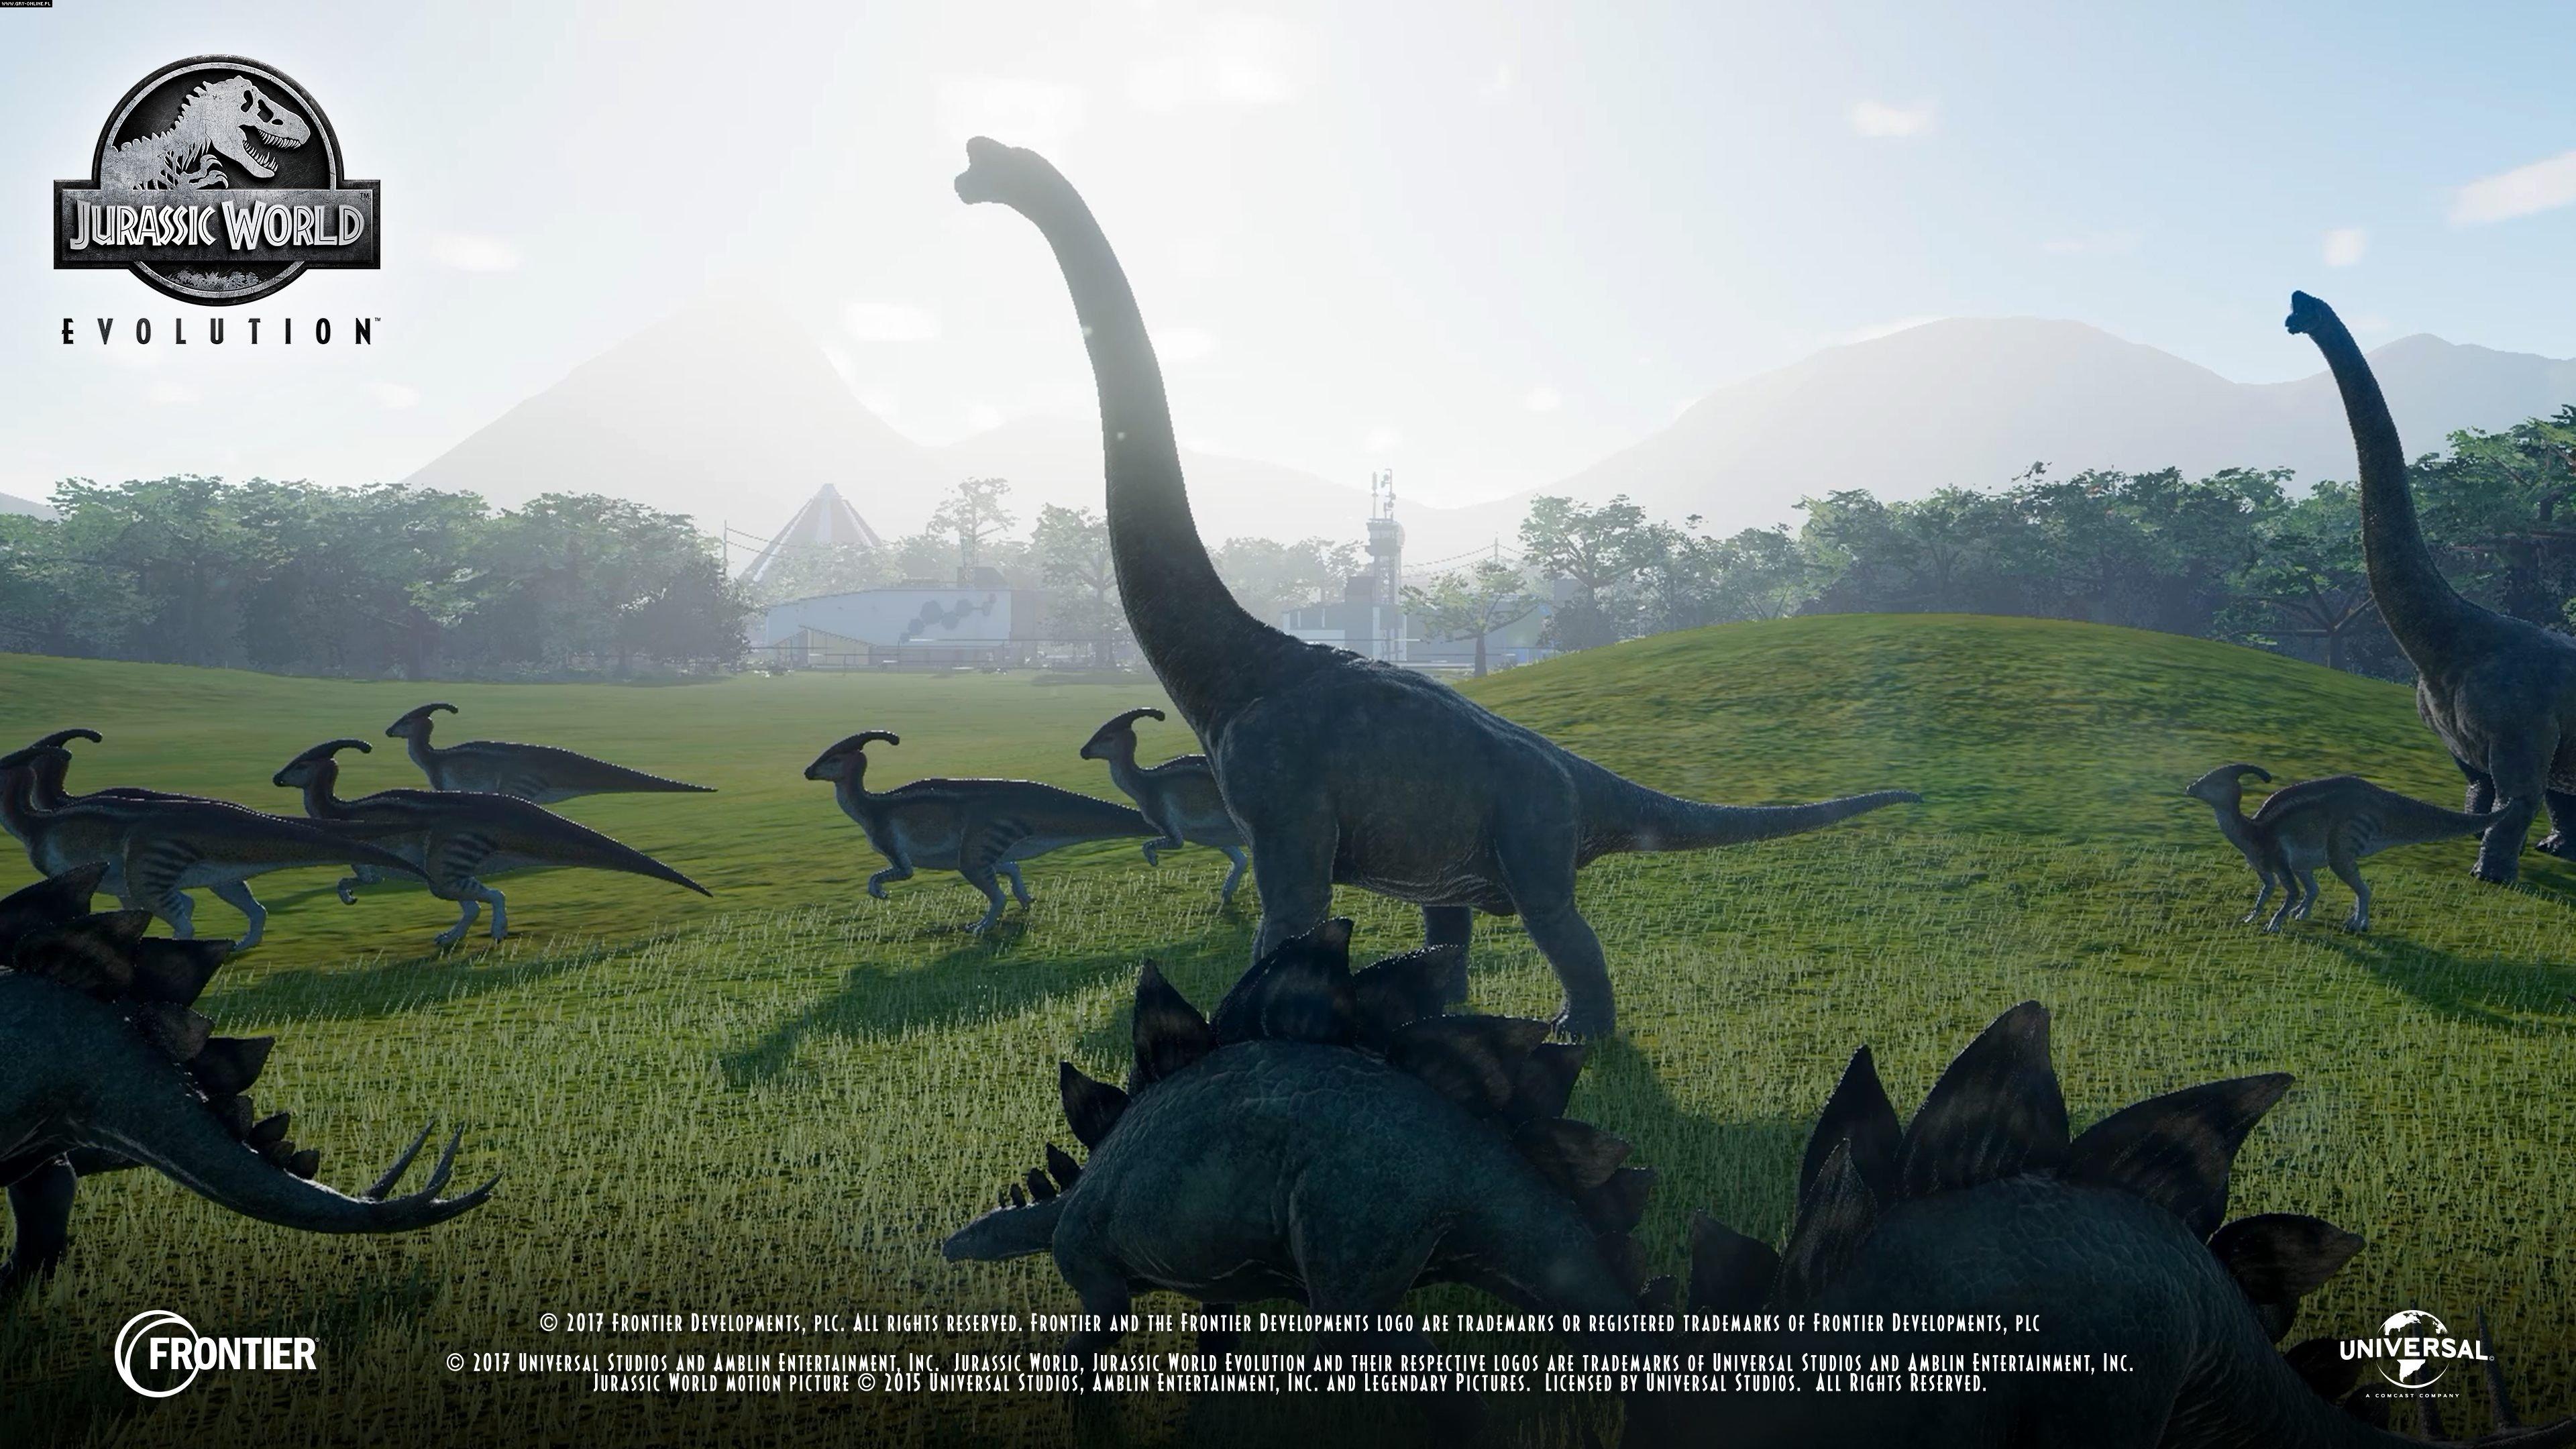 jurassic world evolution free download pc no key